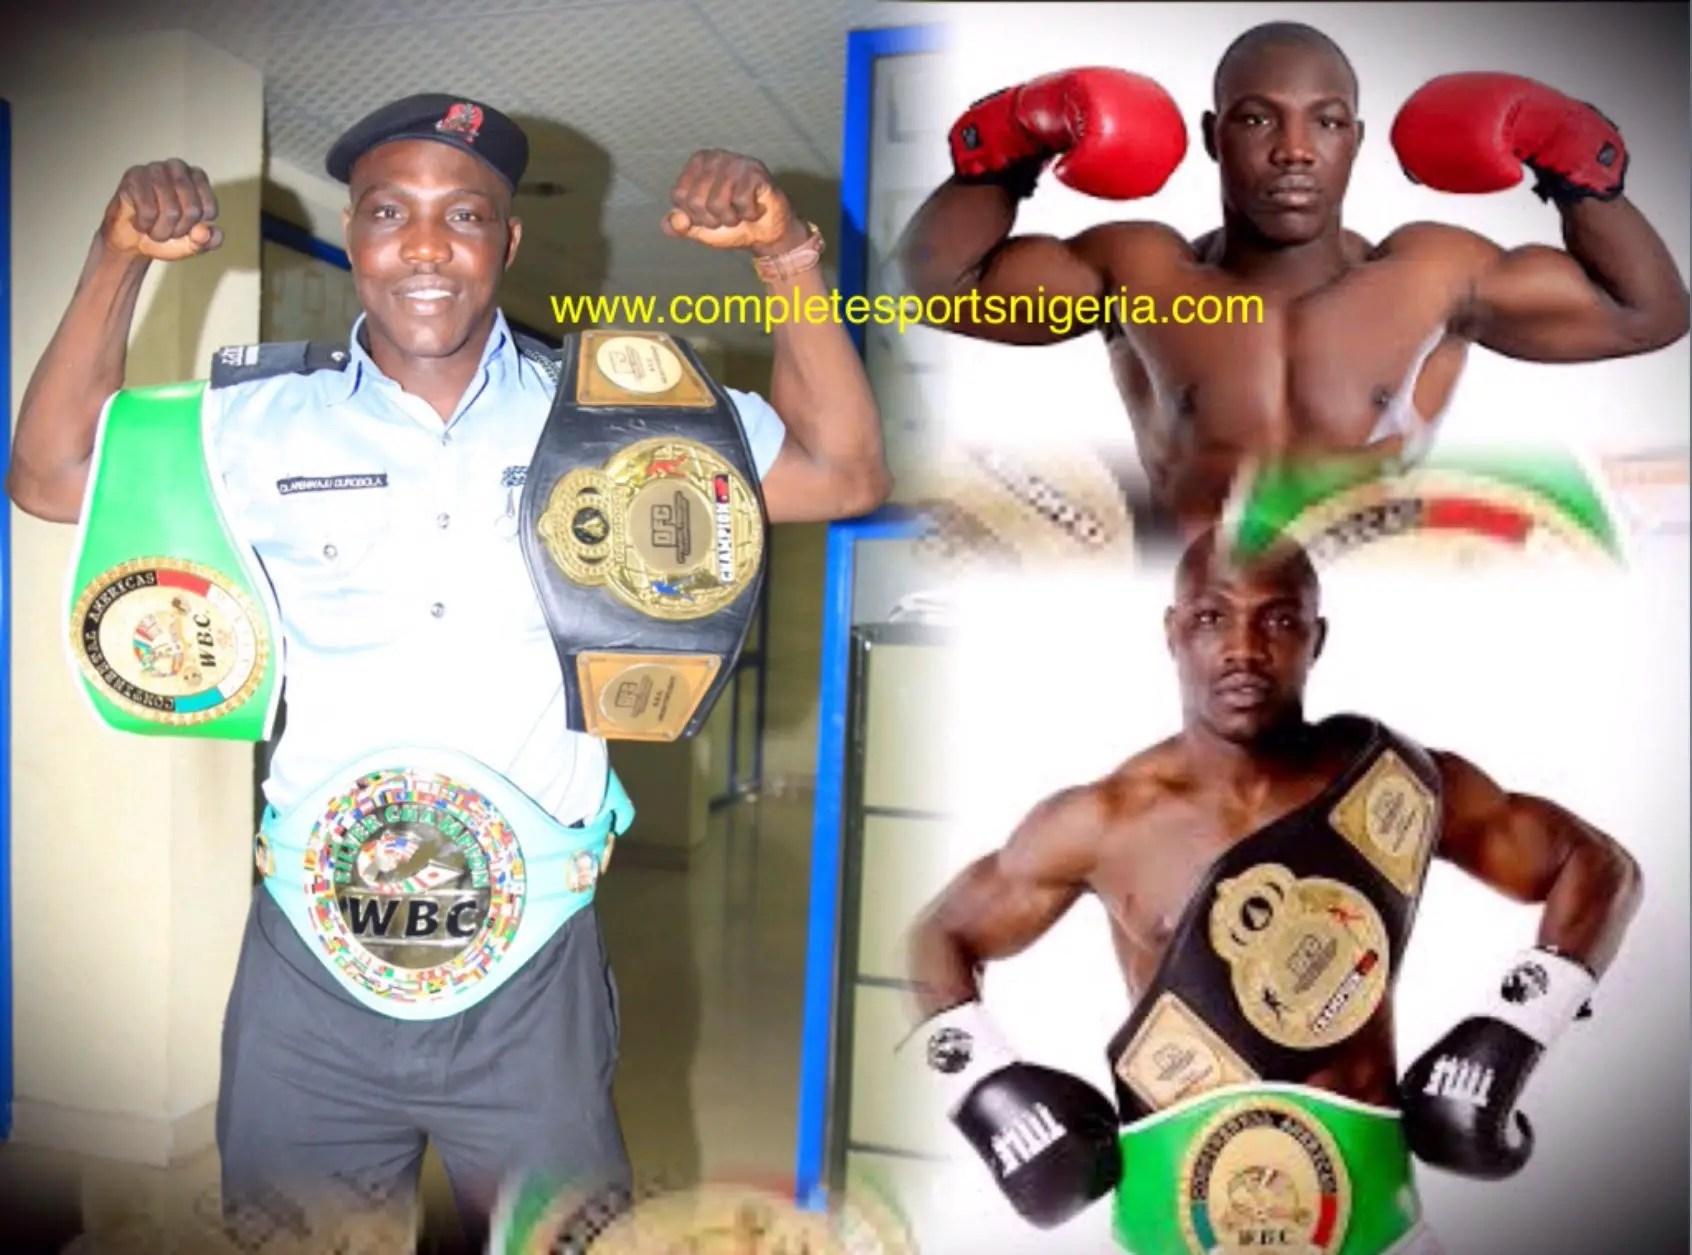 Durodola Confronts Russian For WBC World Title